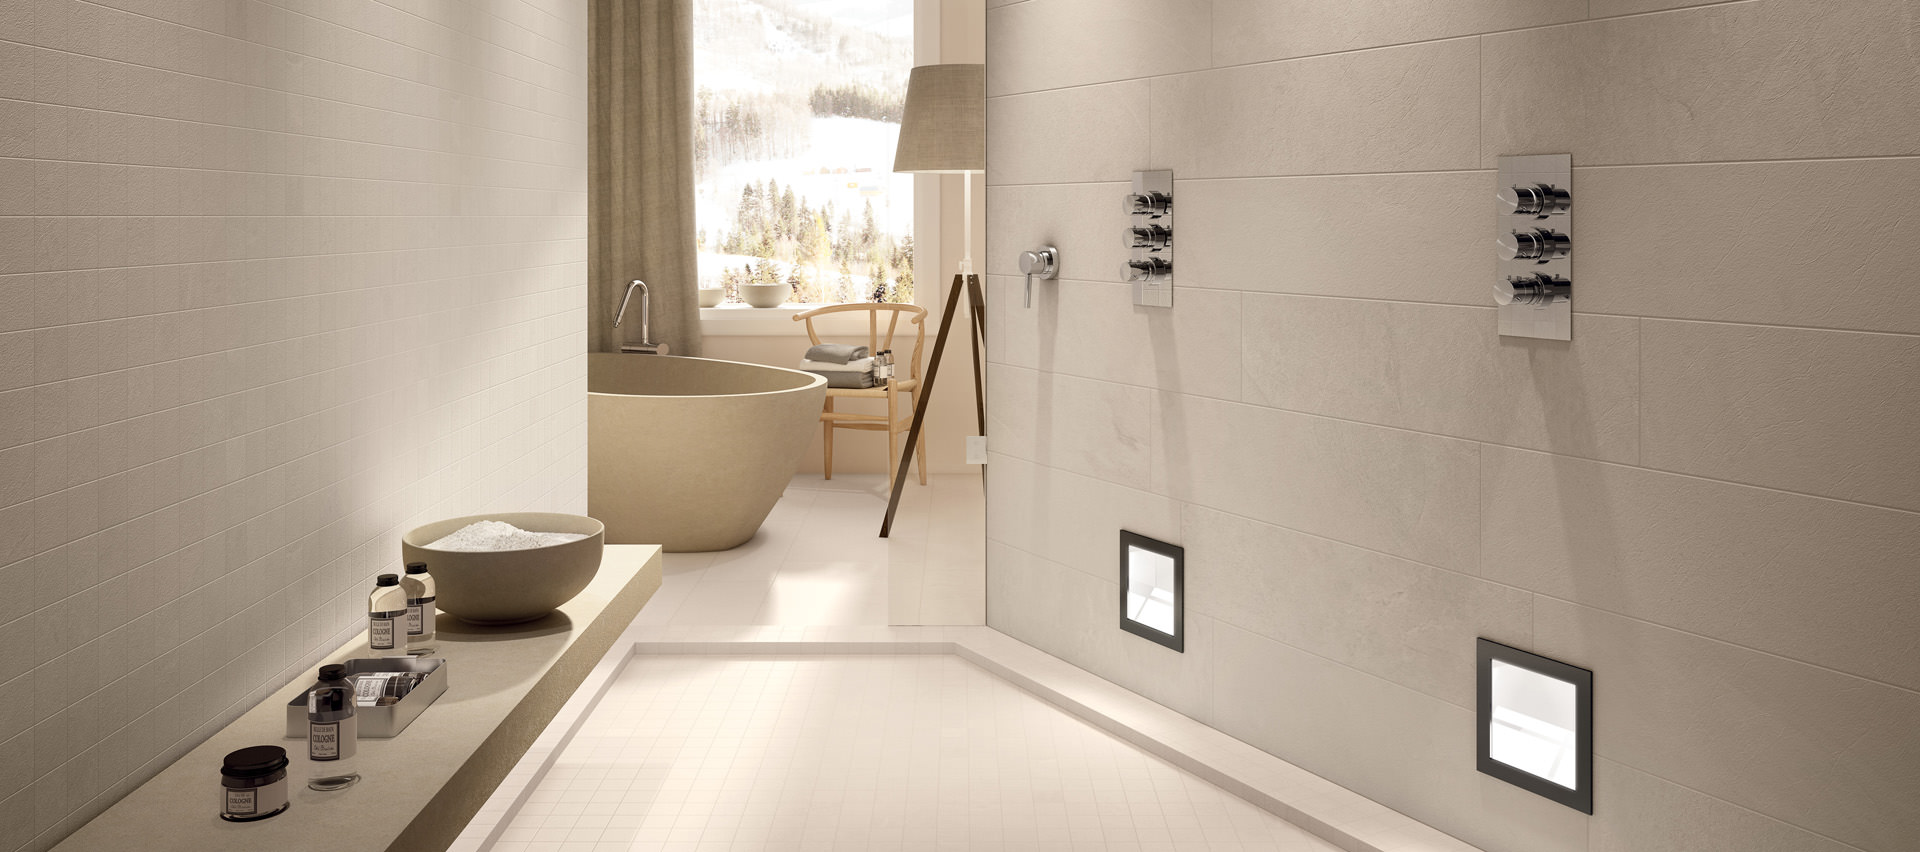 marca corona h ndler f r marca corona fliesen in pulheim. Black Bedroom Furniture Sets. Home Design Ideas